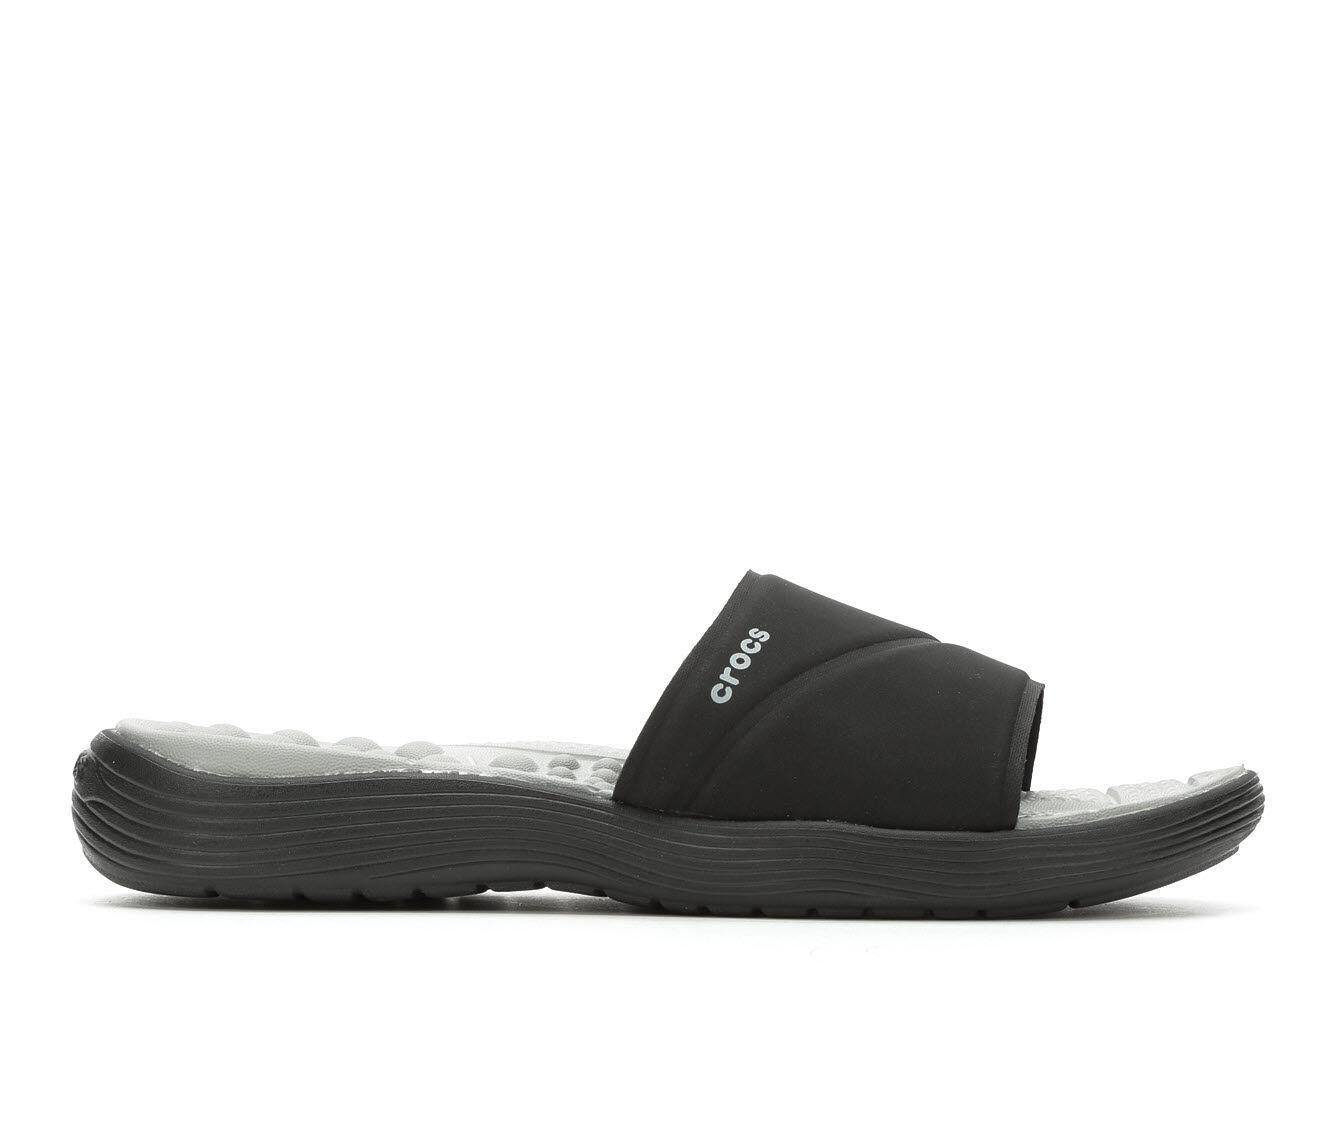 clearance price Women's Crocs Reviva Slides Black/Black